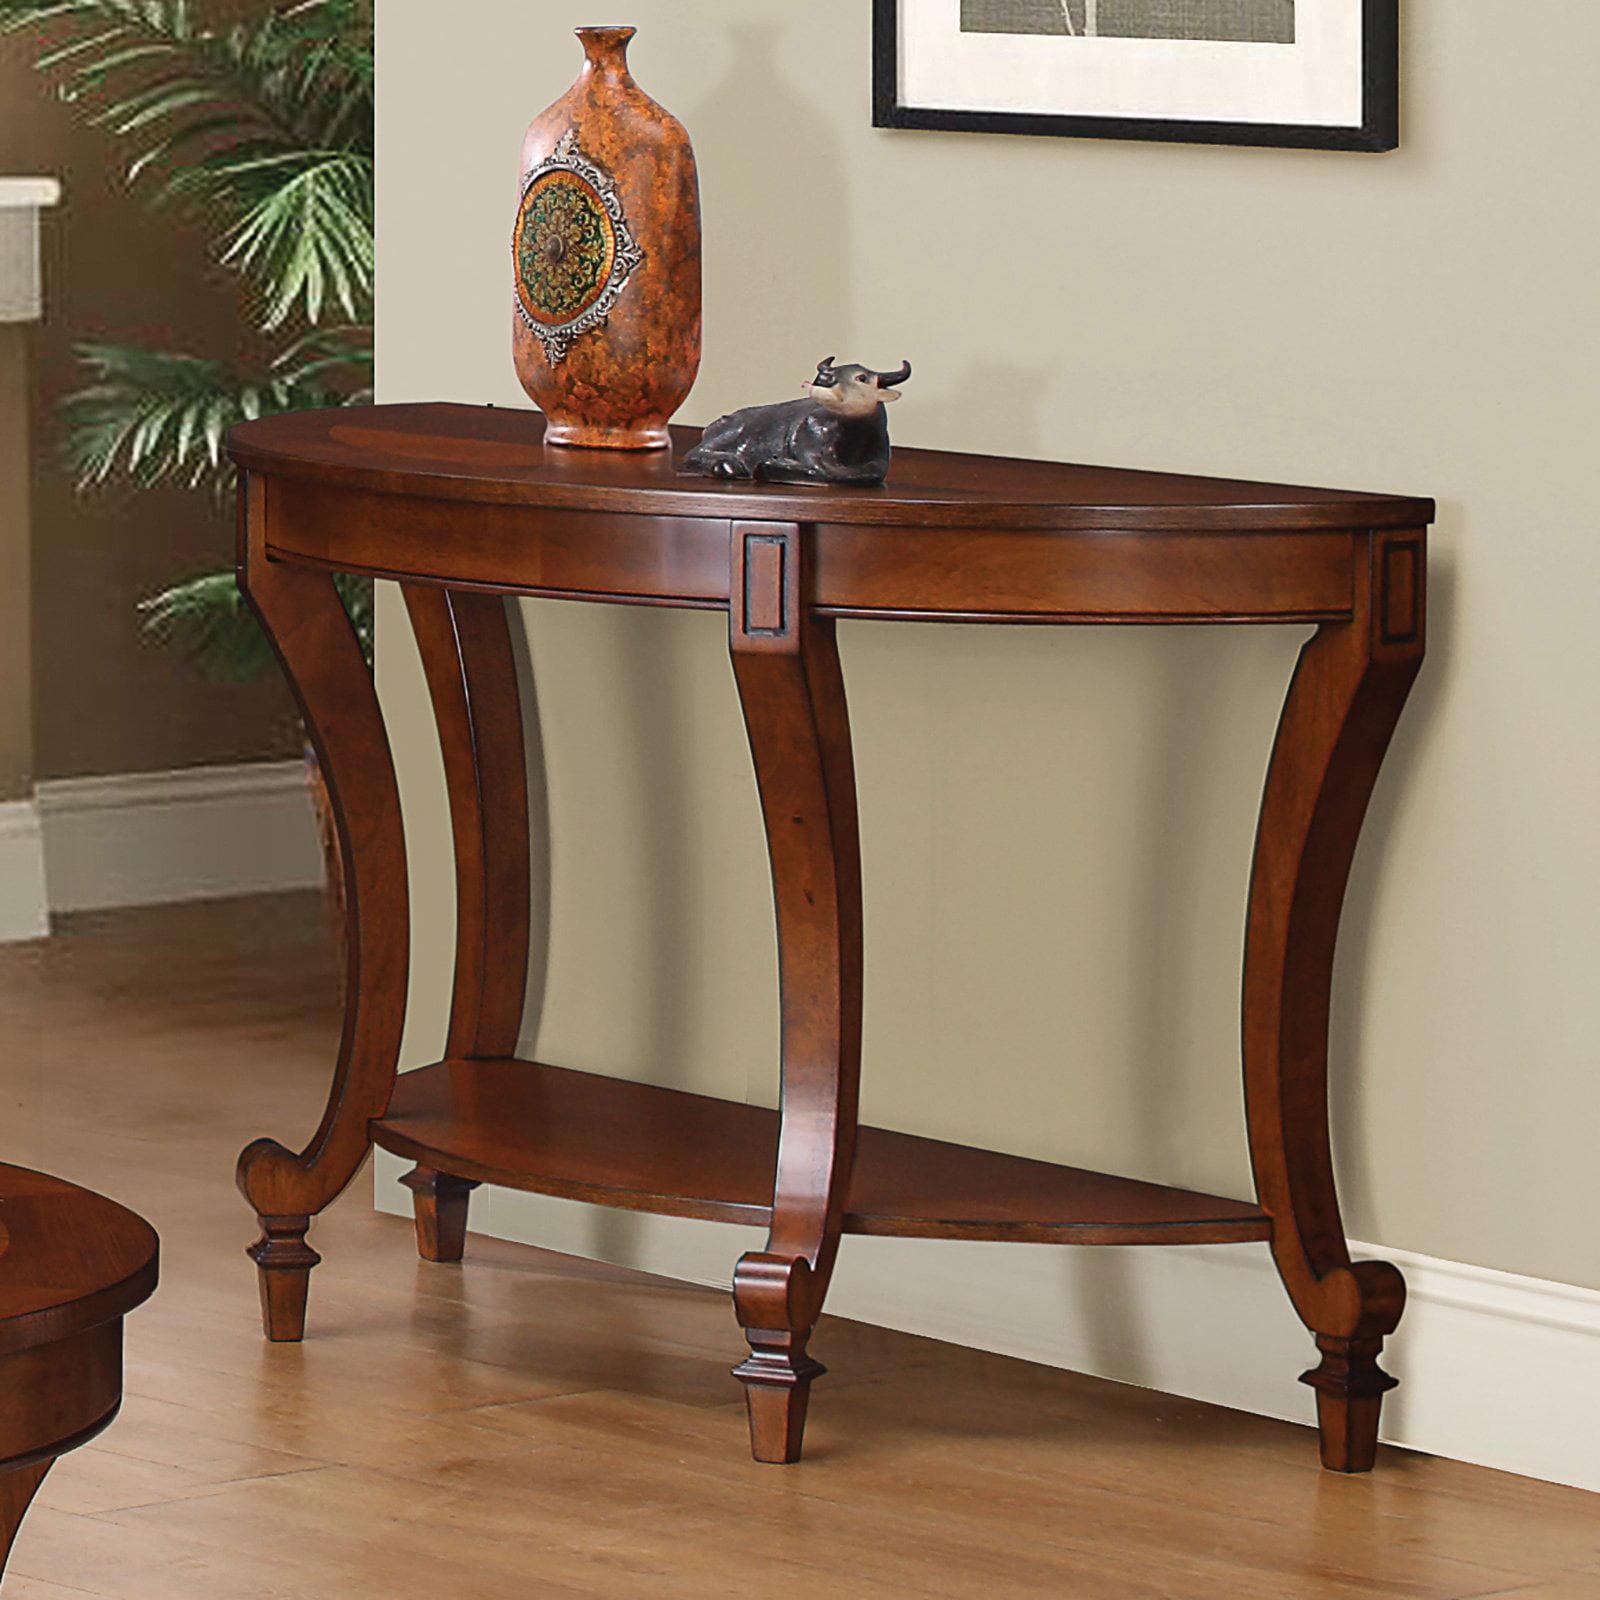 Coaster Company Sofa Table, Warm Brown